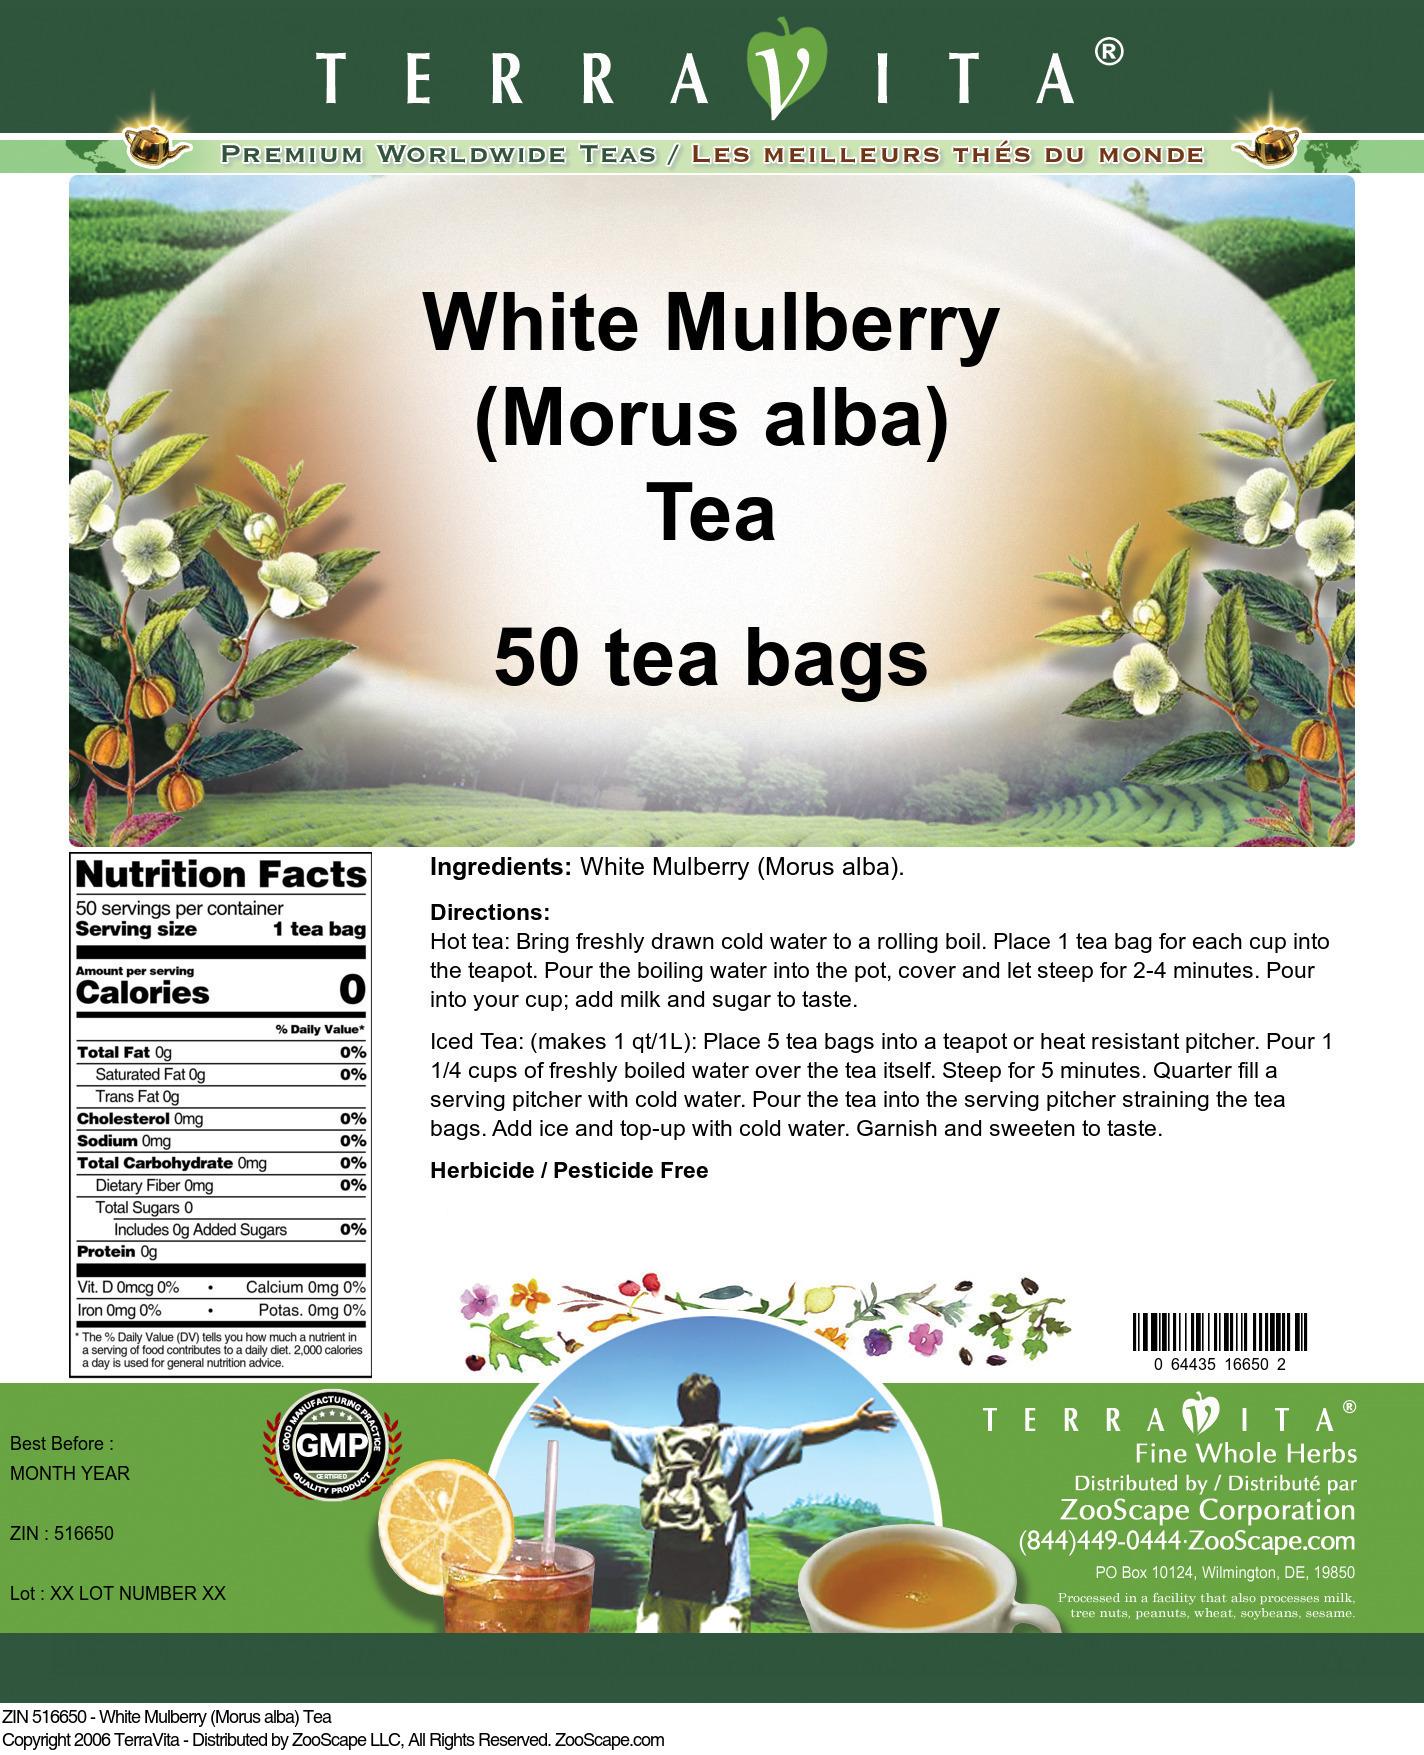 White Mulberry (Morus alba) Tea